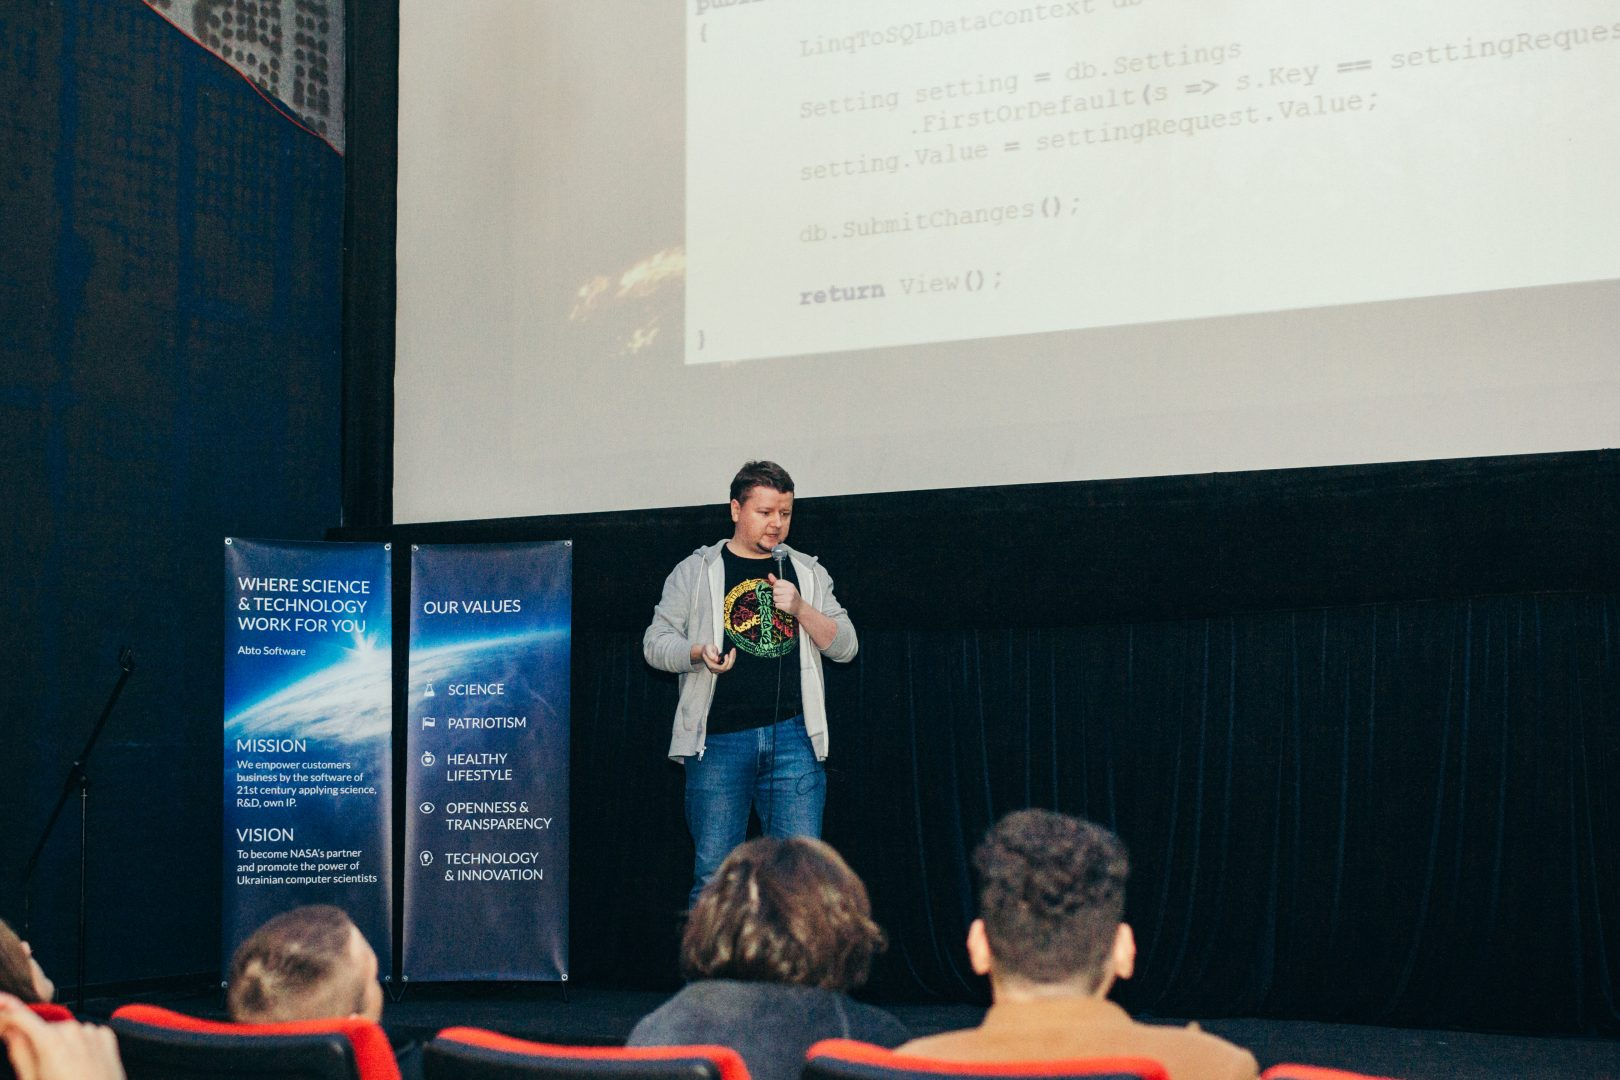 Богдан Макогін, Software Team Assistant в InterLogic